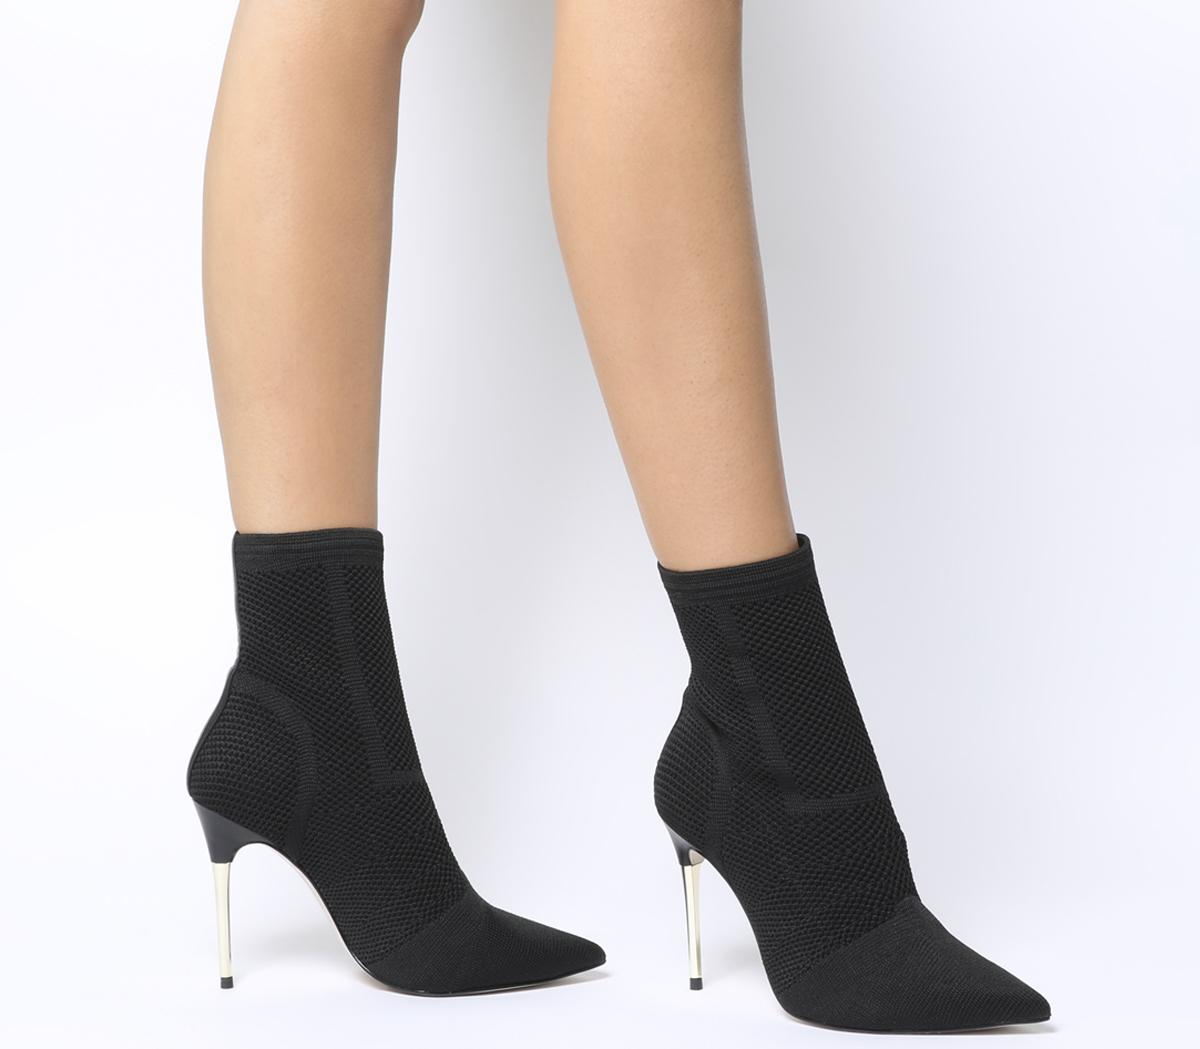 Aflame Metal Heel Sock Boots Black Knit